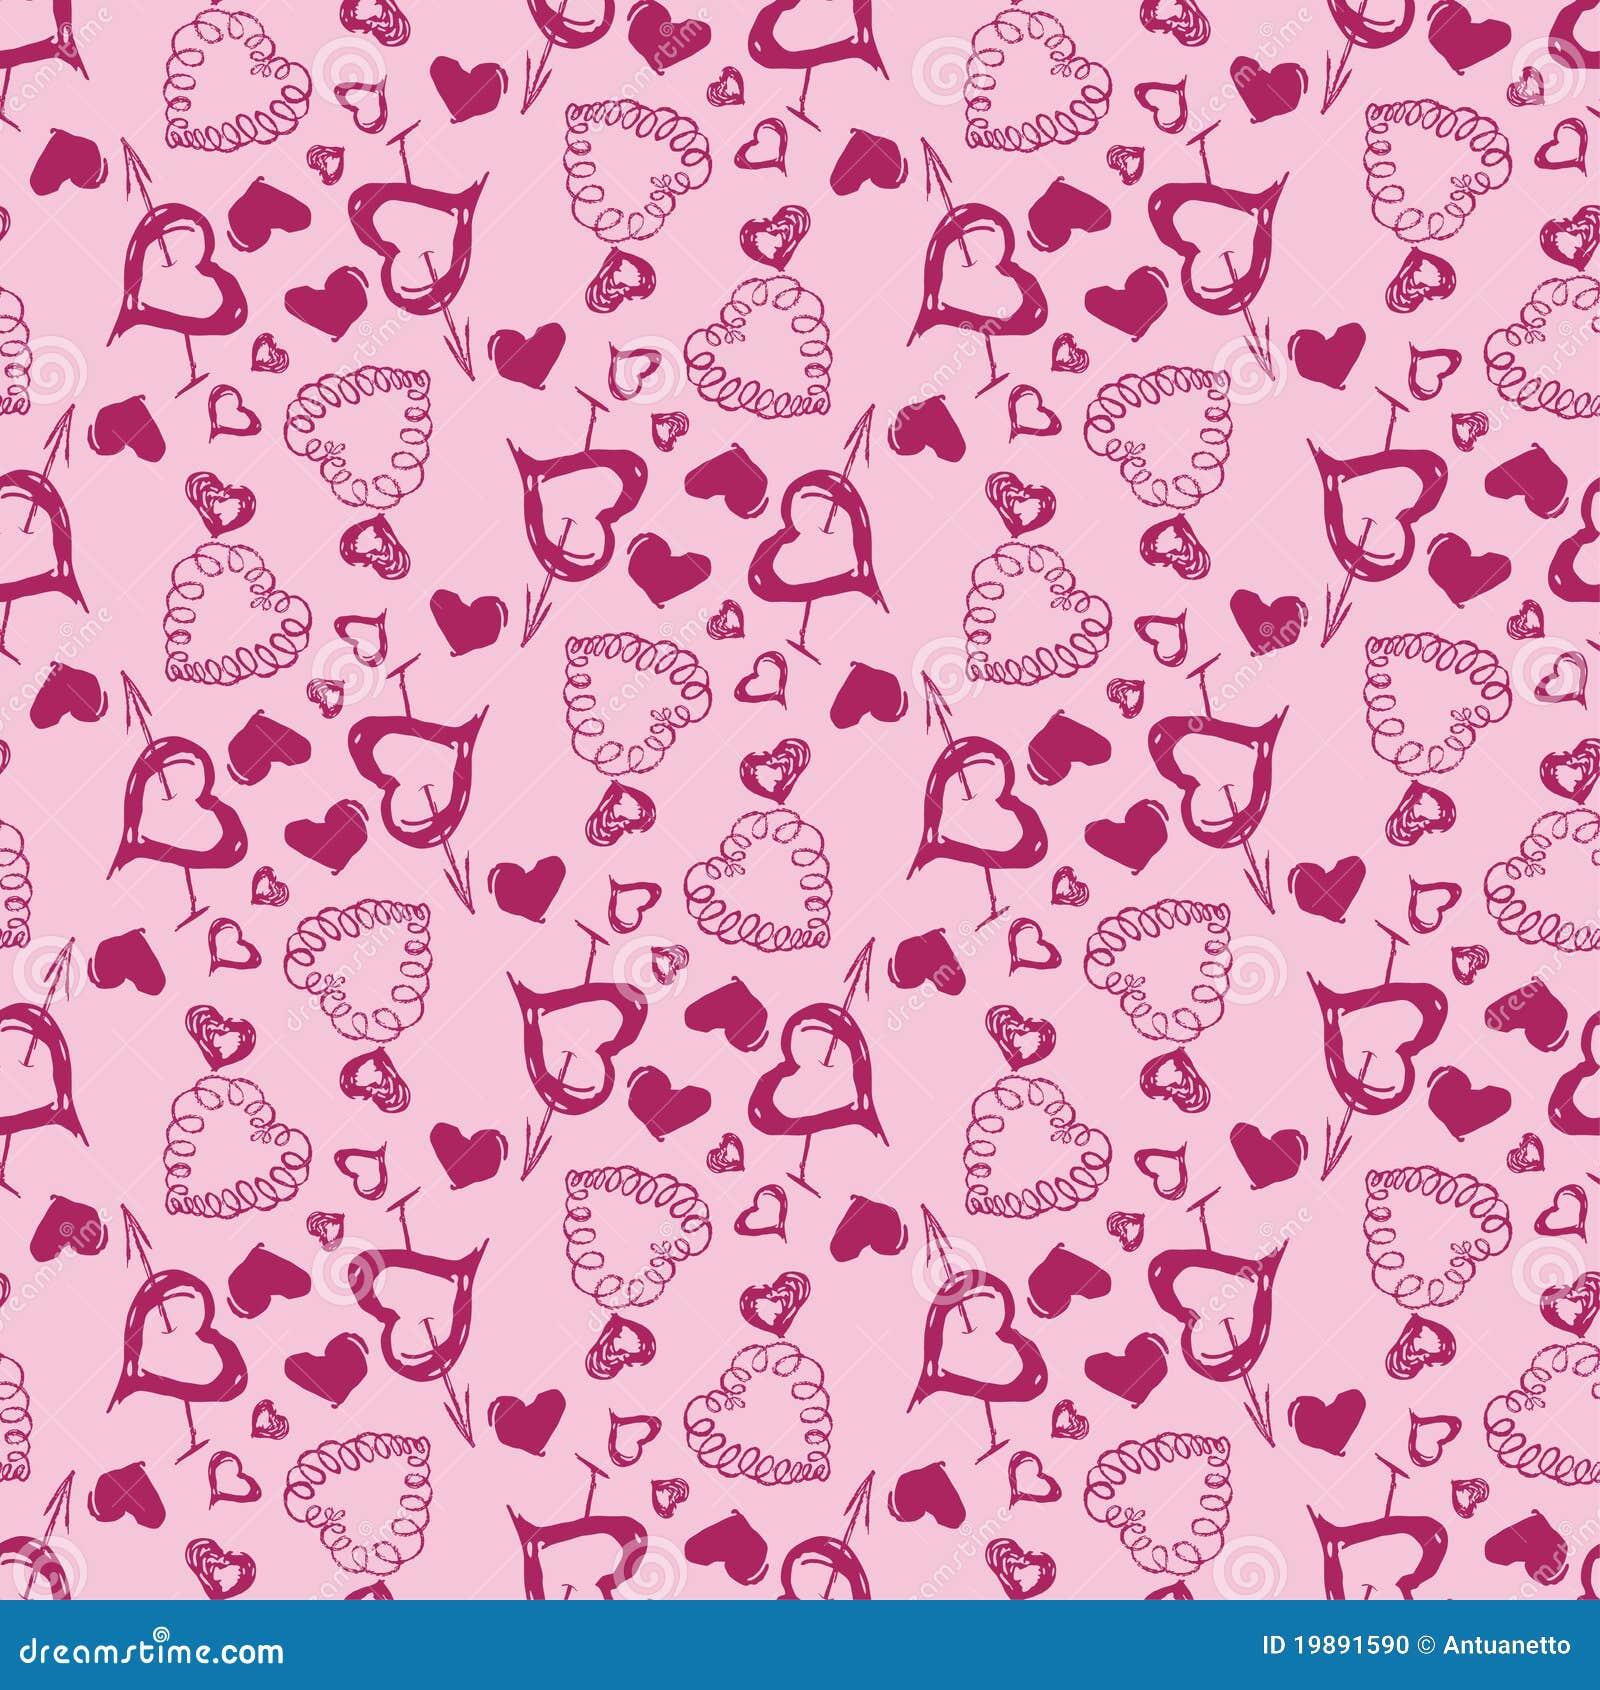 Love Heart Vector Seamless Pattern Stock Photo Image